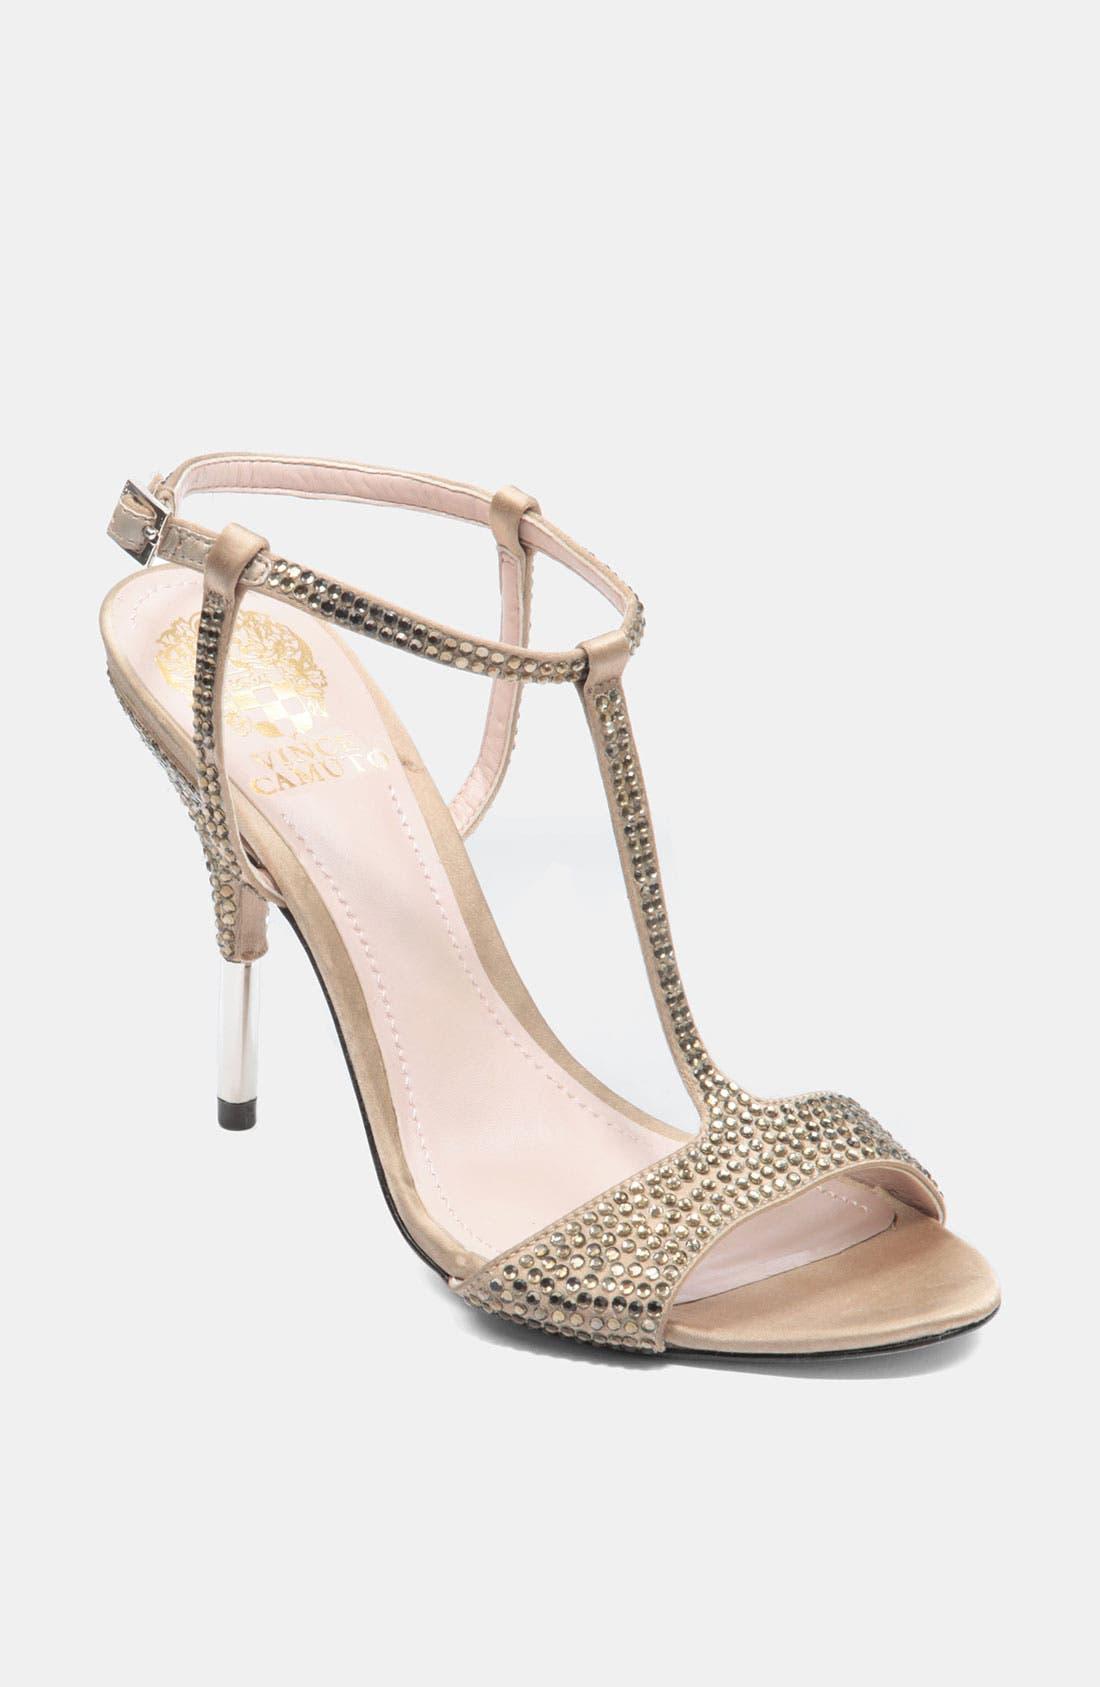 Main Image - Vince Camuto 'Kheringtn' Sandal